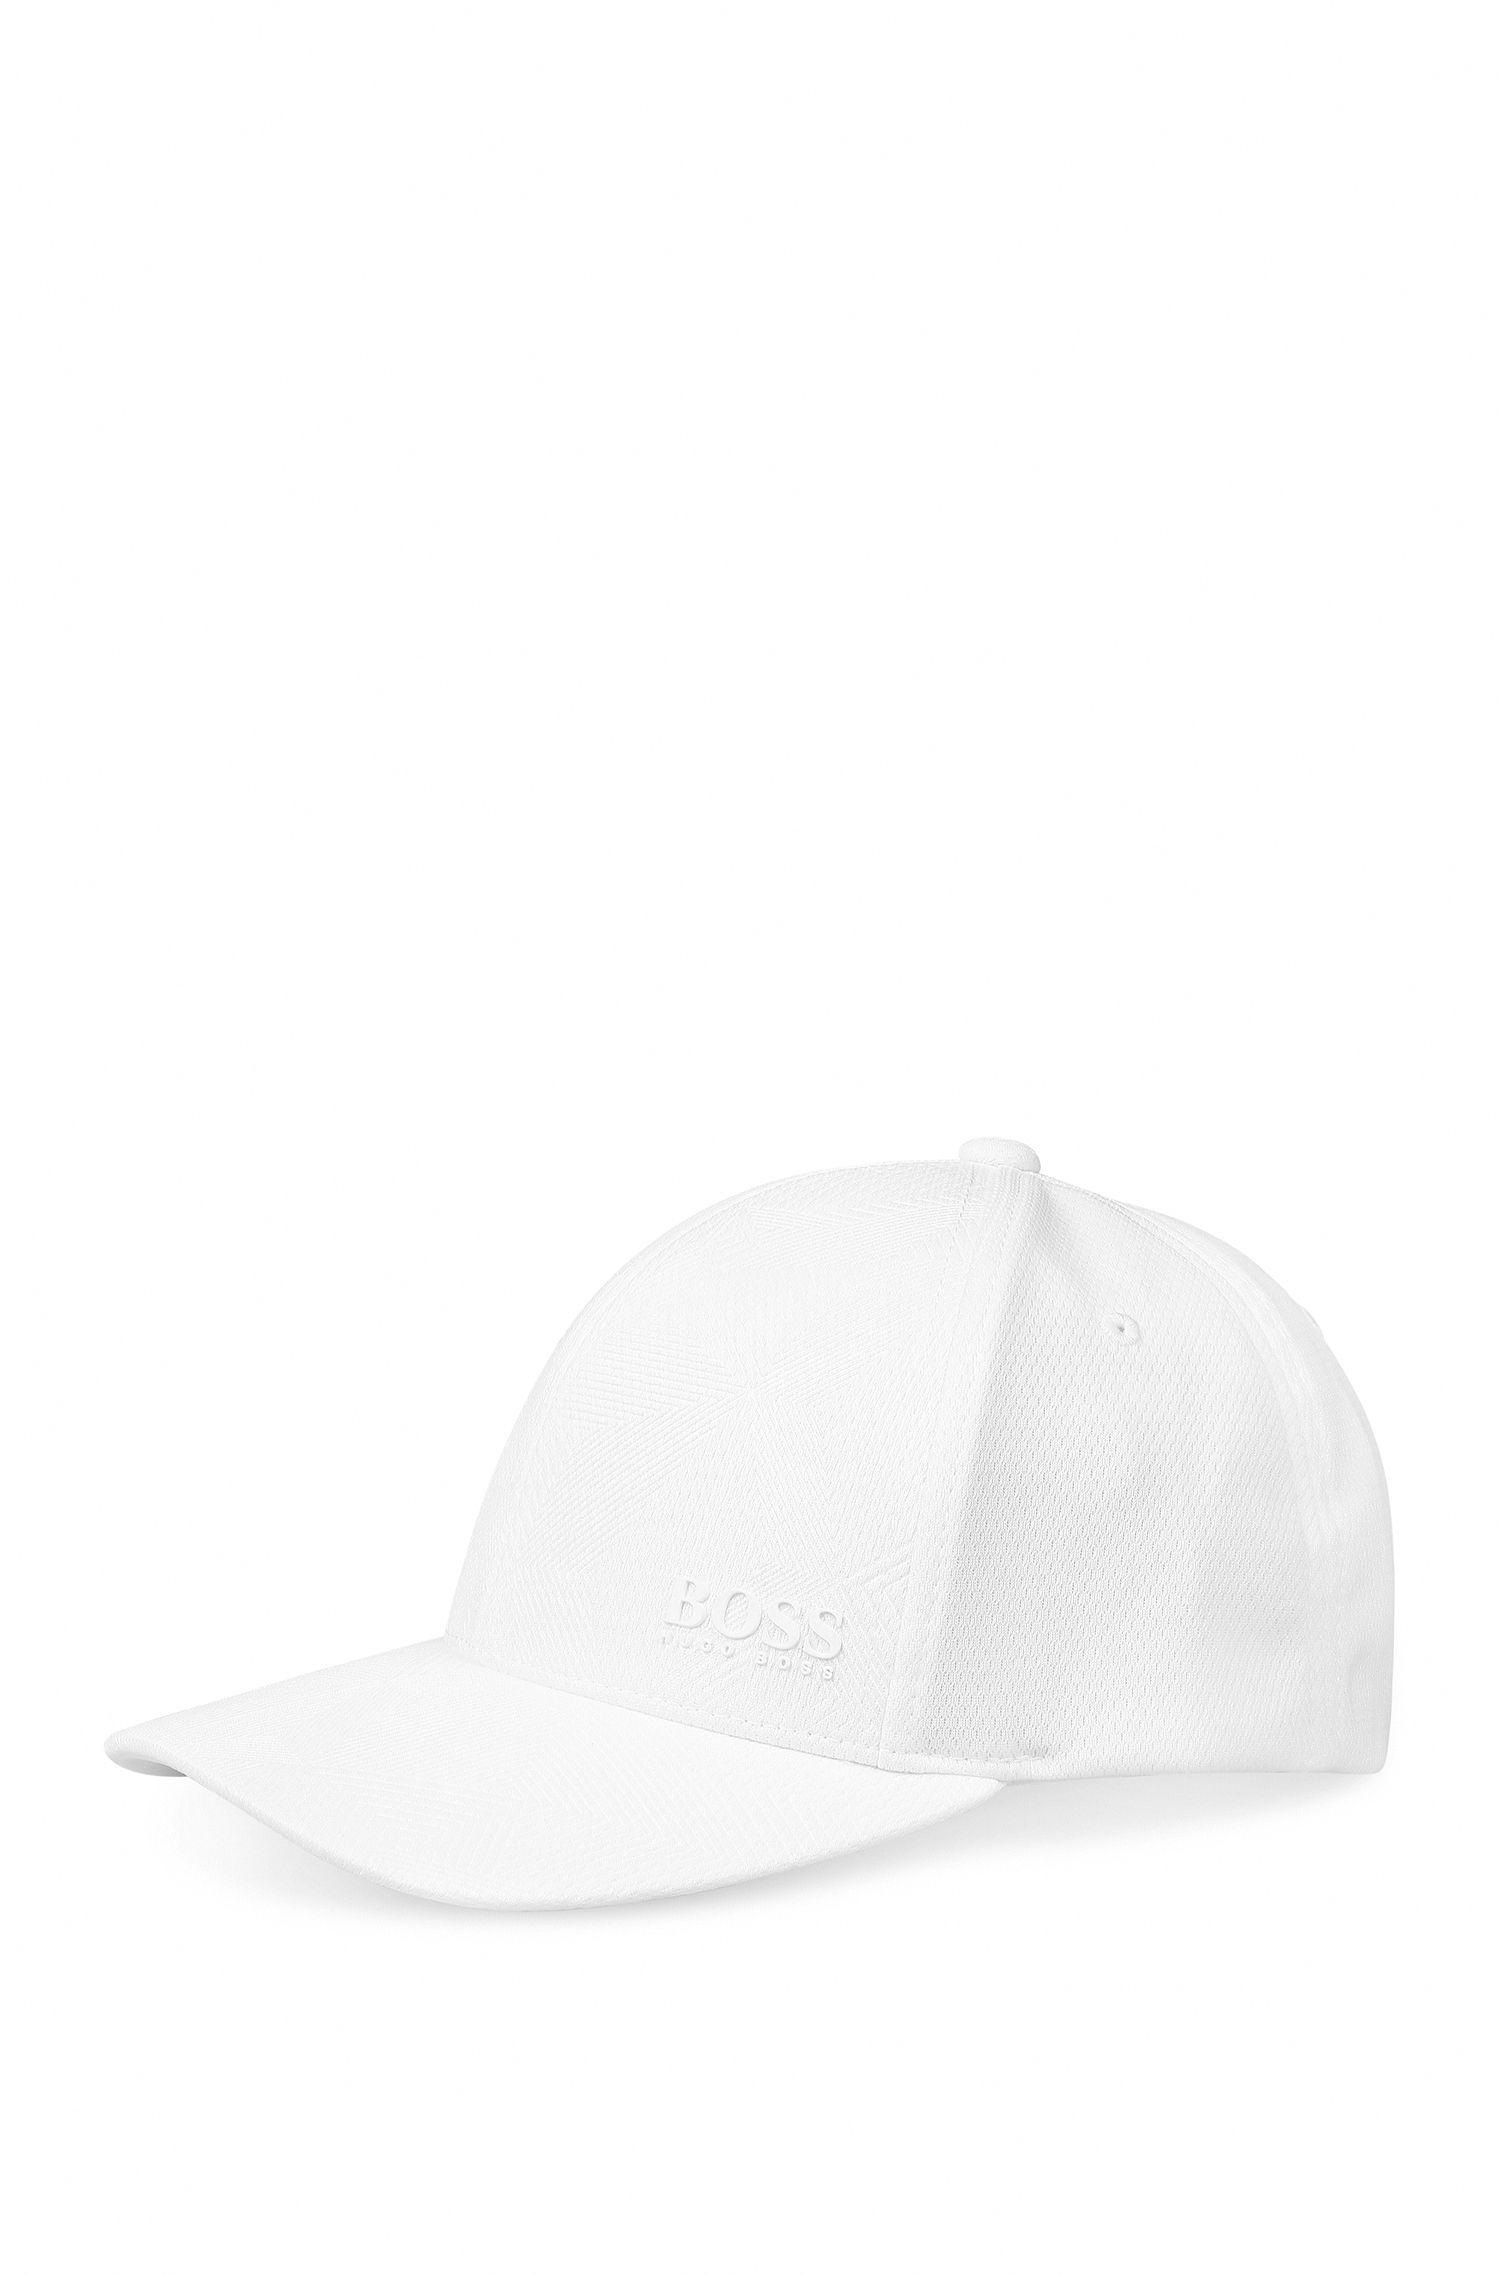 'Printcap' | Geometric Print Baseball Cap